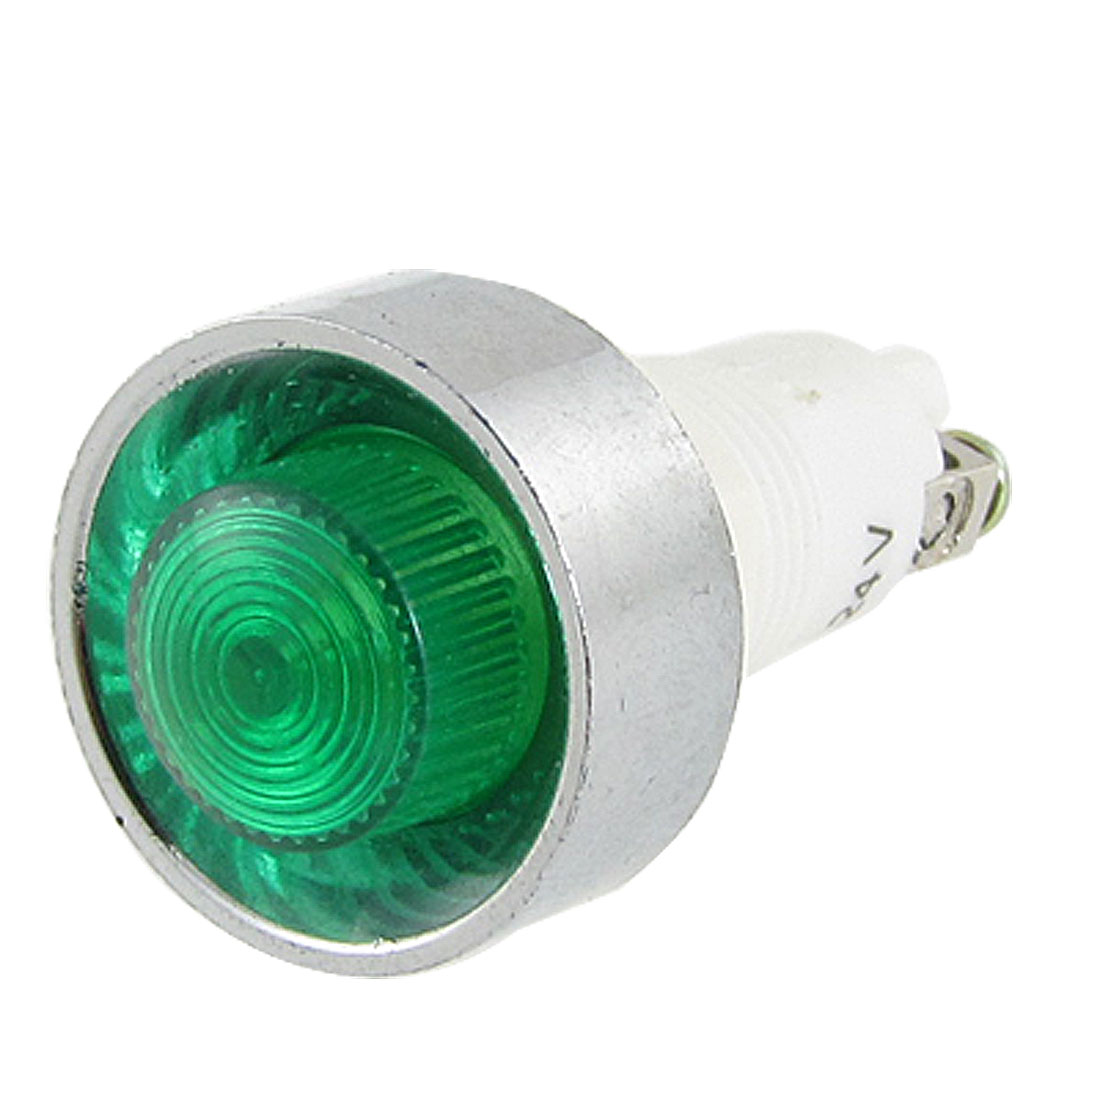 DC 24V Green Cap Emergency Signal Indicator Lamp Light